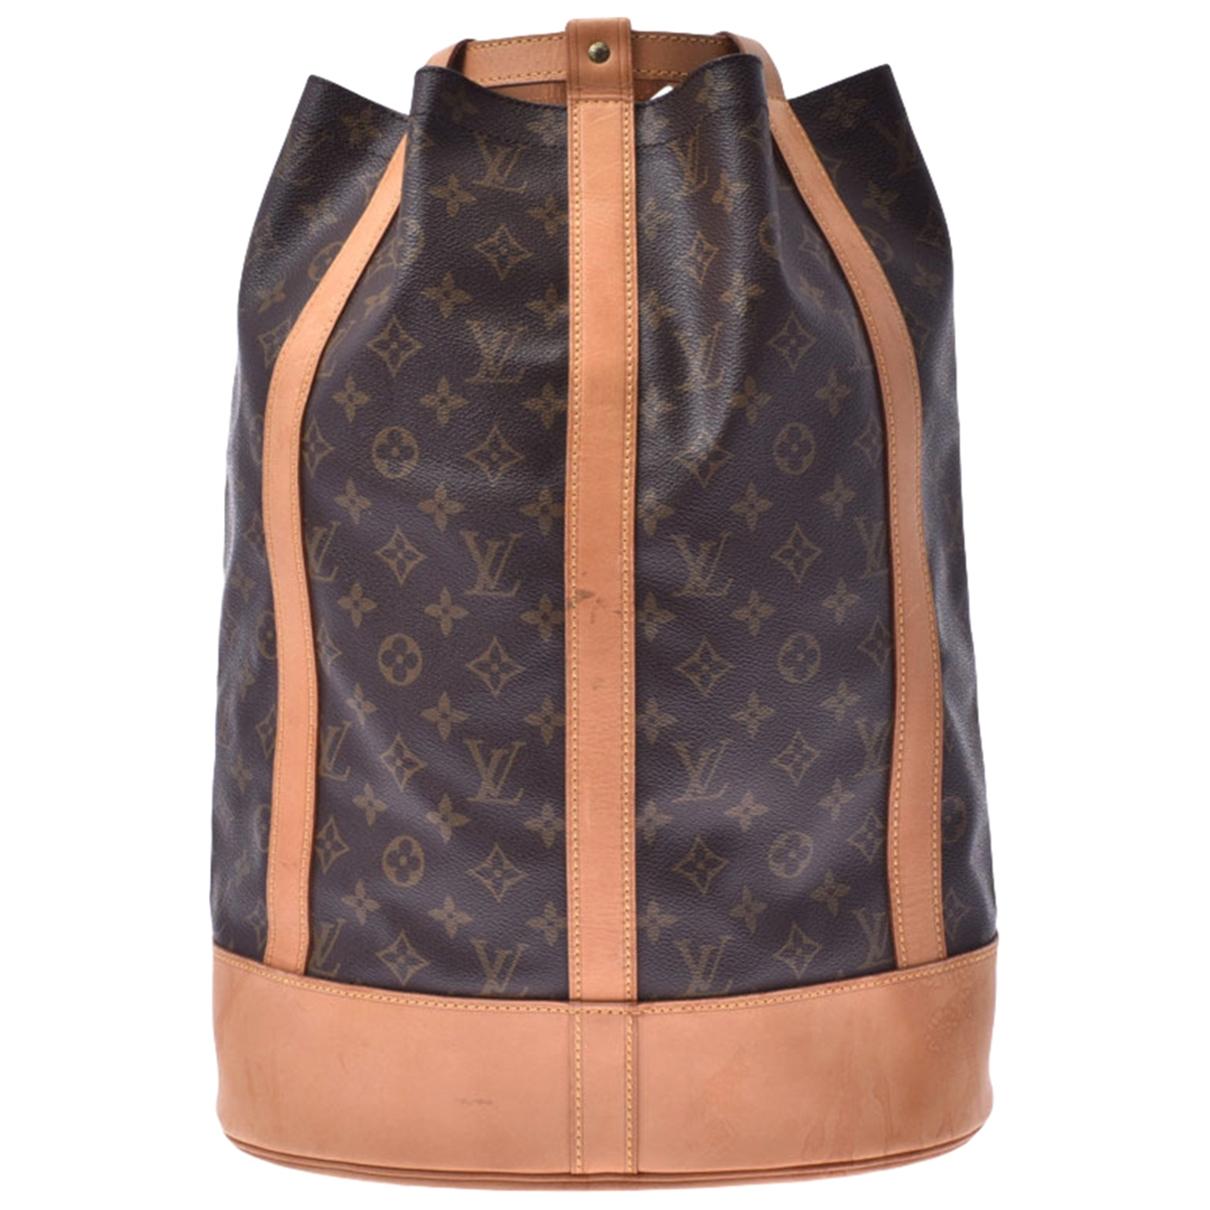 Bolso  Randonnee de Lona Louis Vuitton